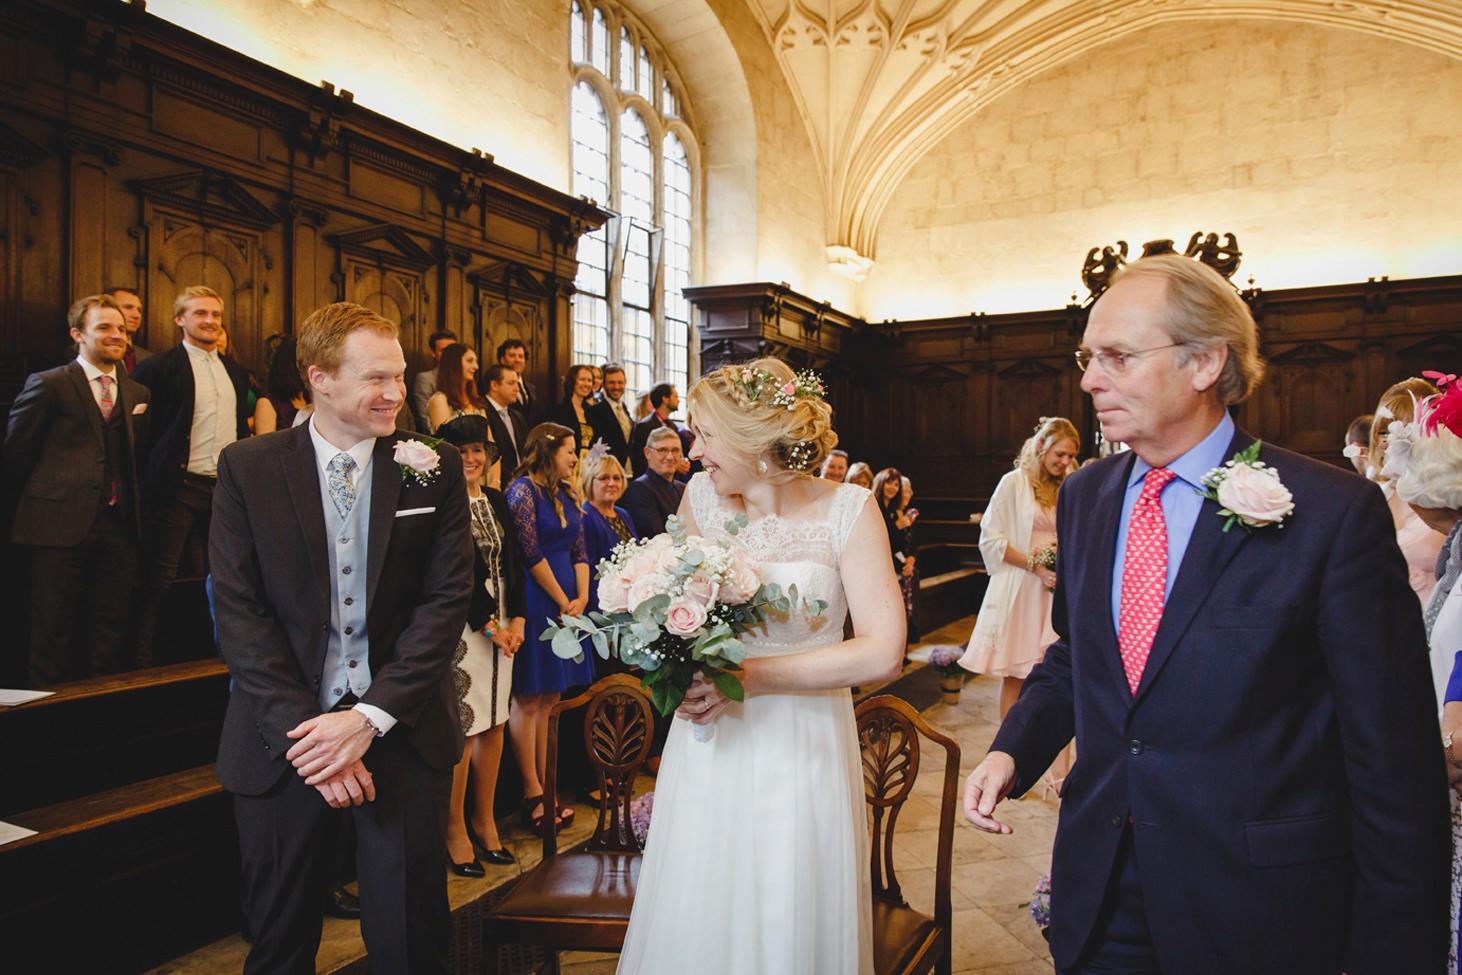 Bodleian library wedding bride greets groom